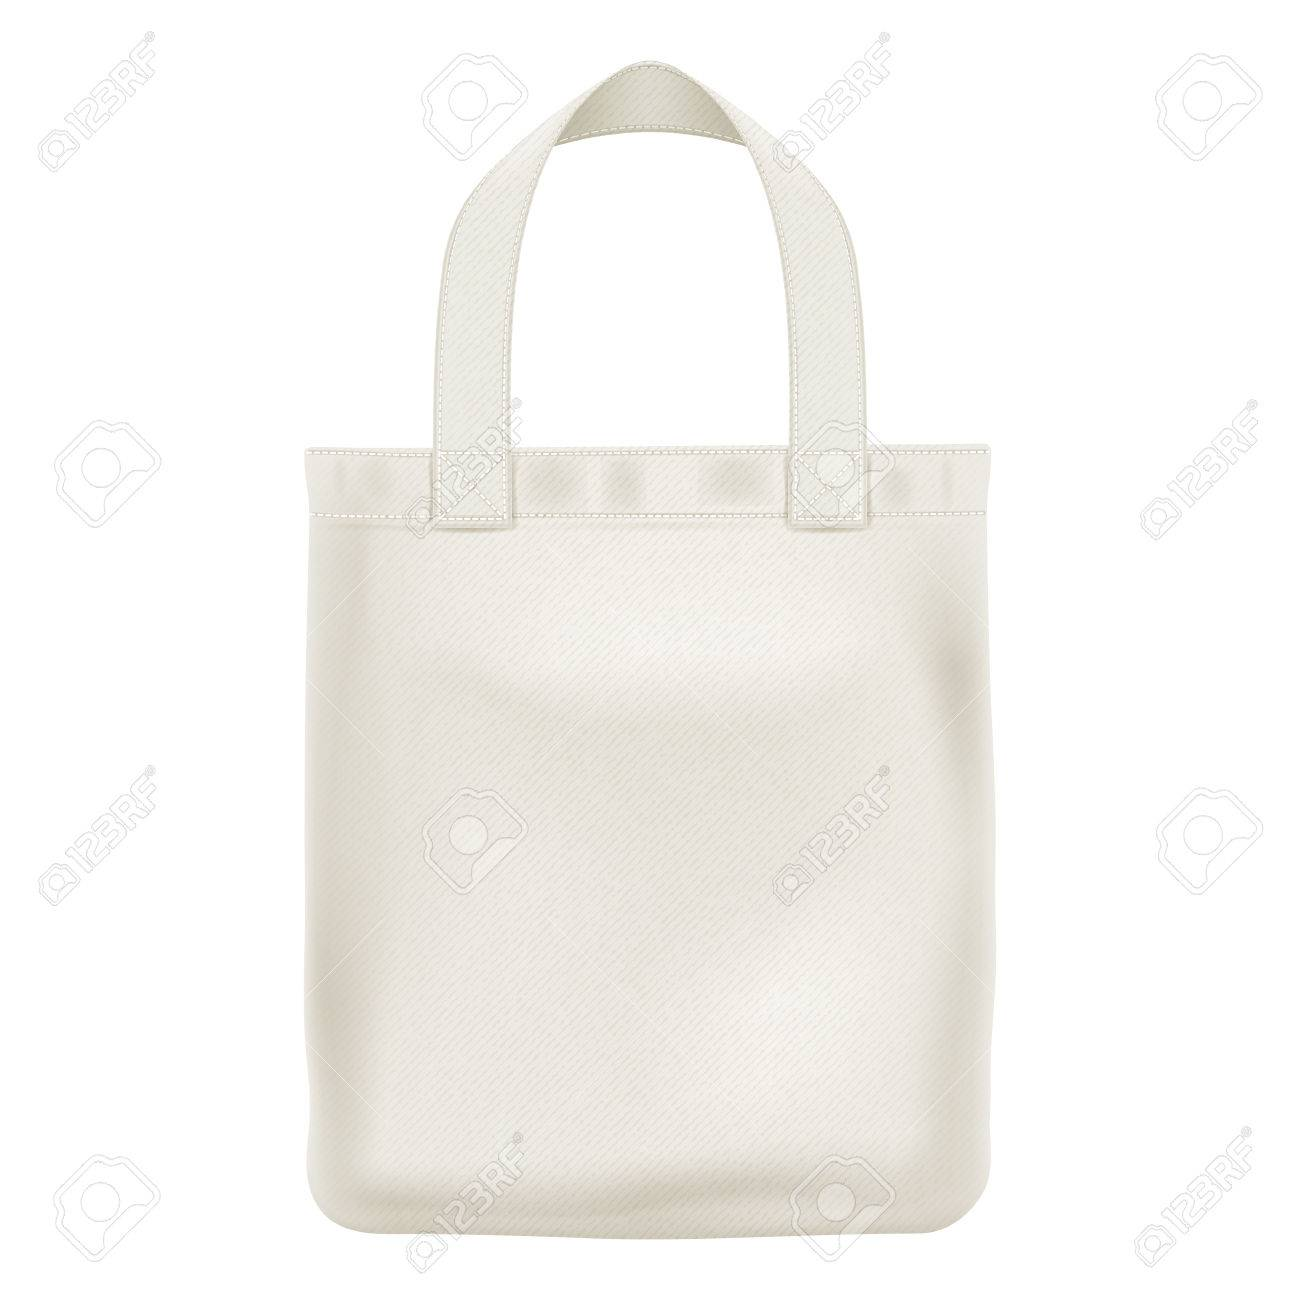 Eco textile tote shopper bag vector illustration. Good for branding design. - 59873219